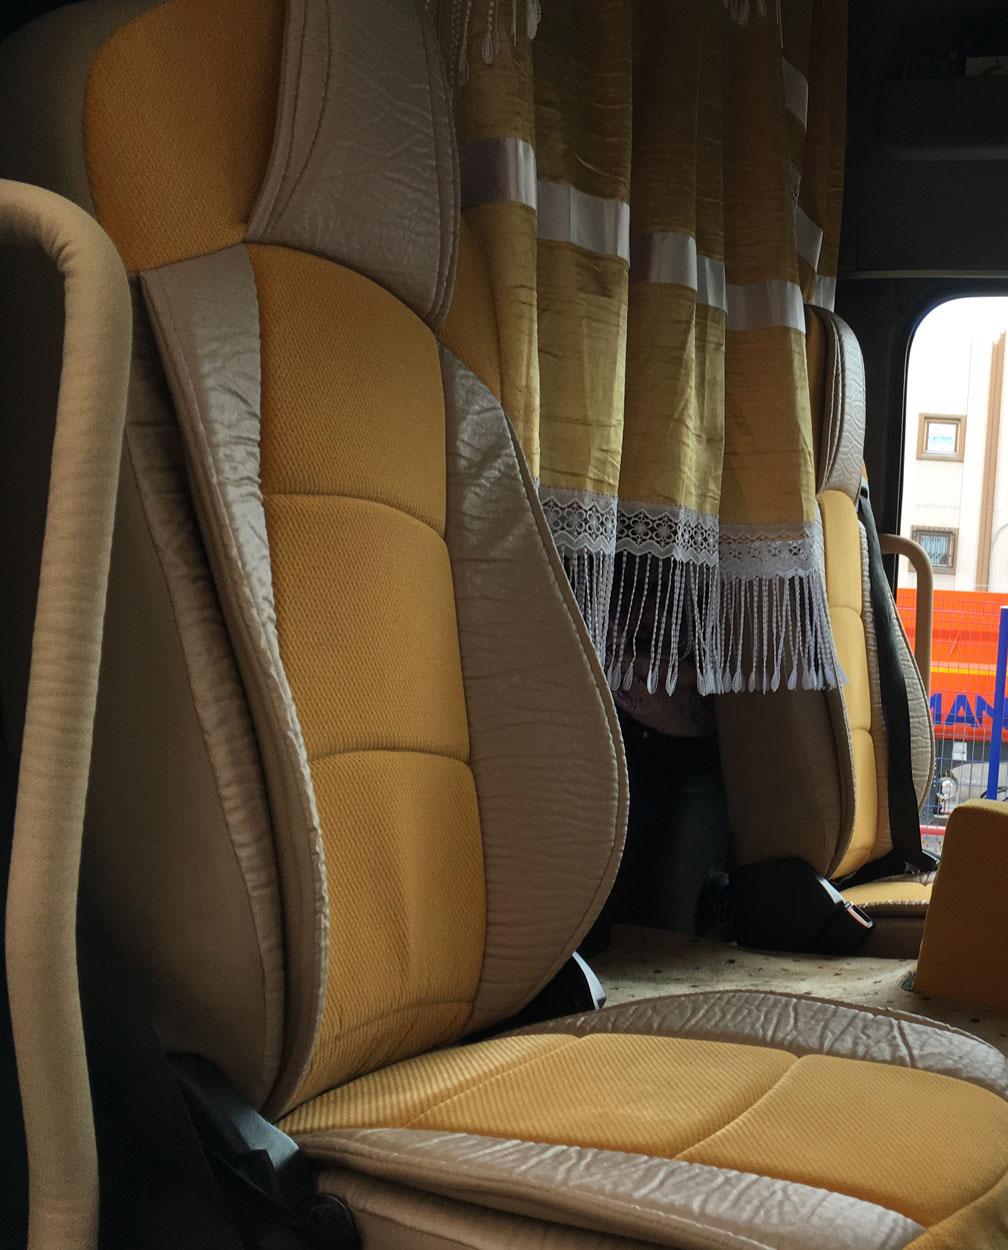 mitsubishi-tır-kamyon-otobüs-çekici-otomobil-iç-dizayn-koltuk-döşeme-konya